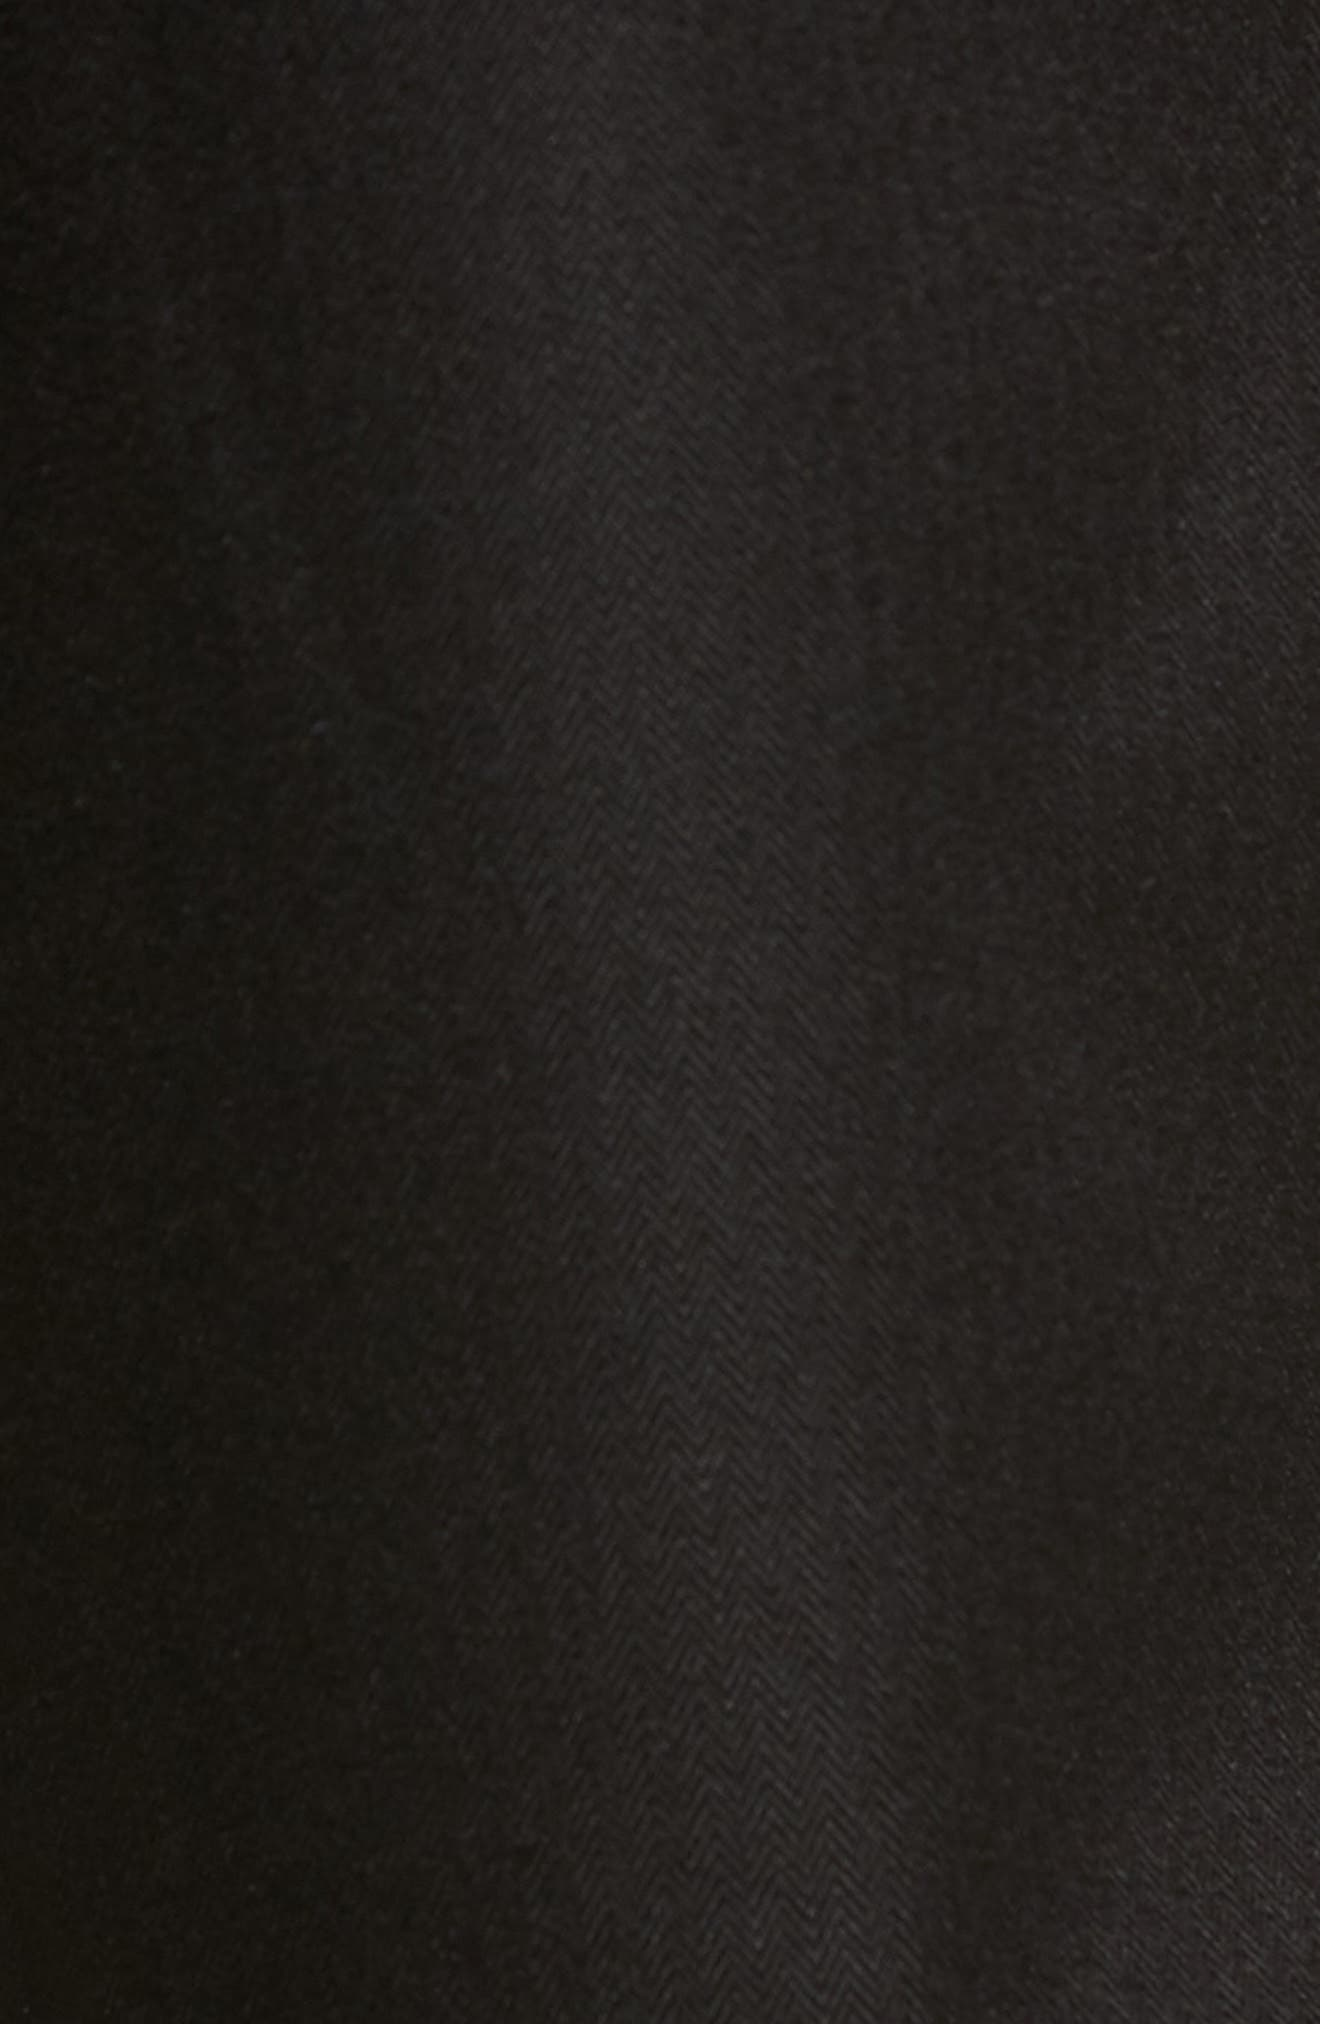 Gatekeeper Waterproof Pants,                             Alternate thumbnail 5, color,                             TNF BLACK/TNF BLACK